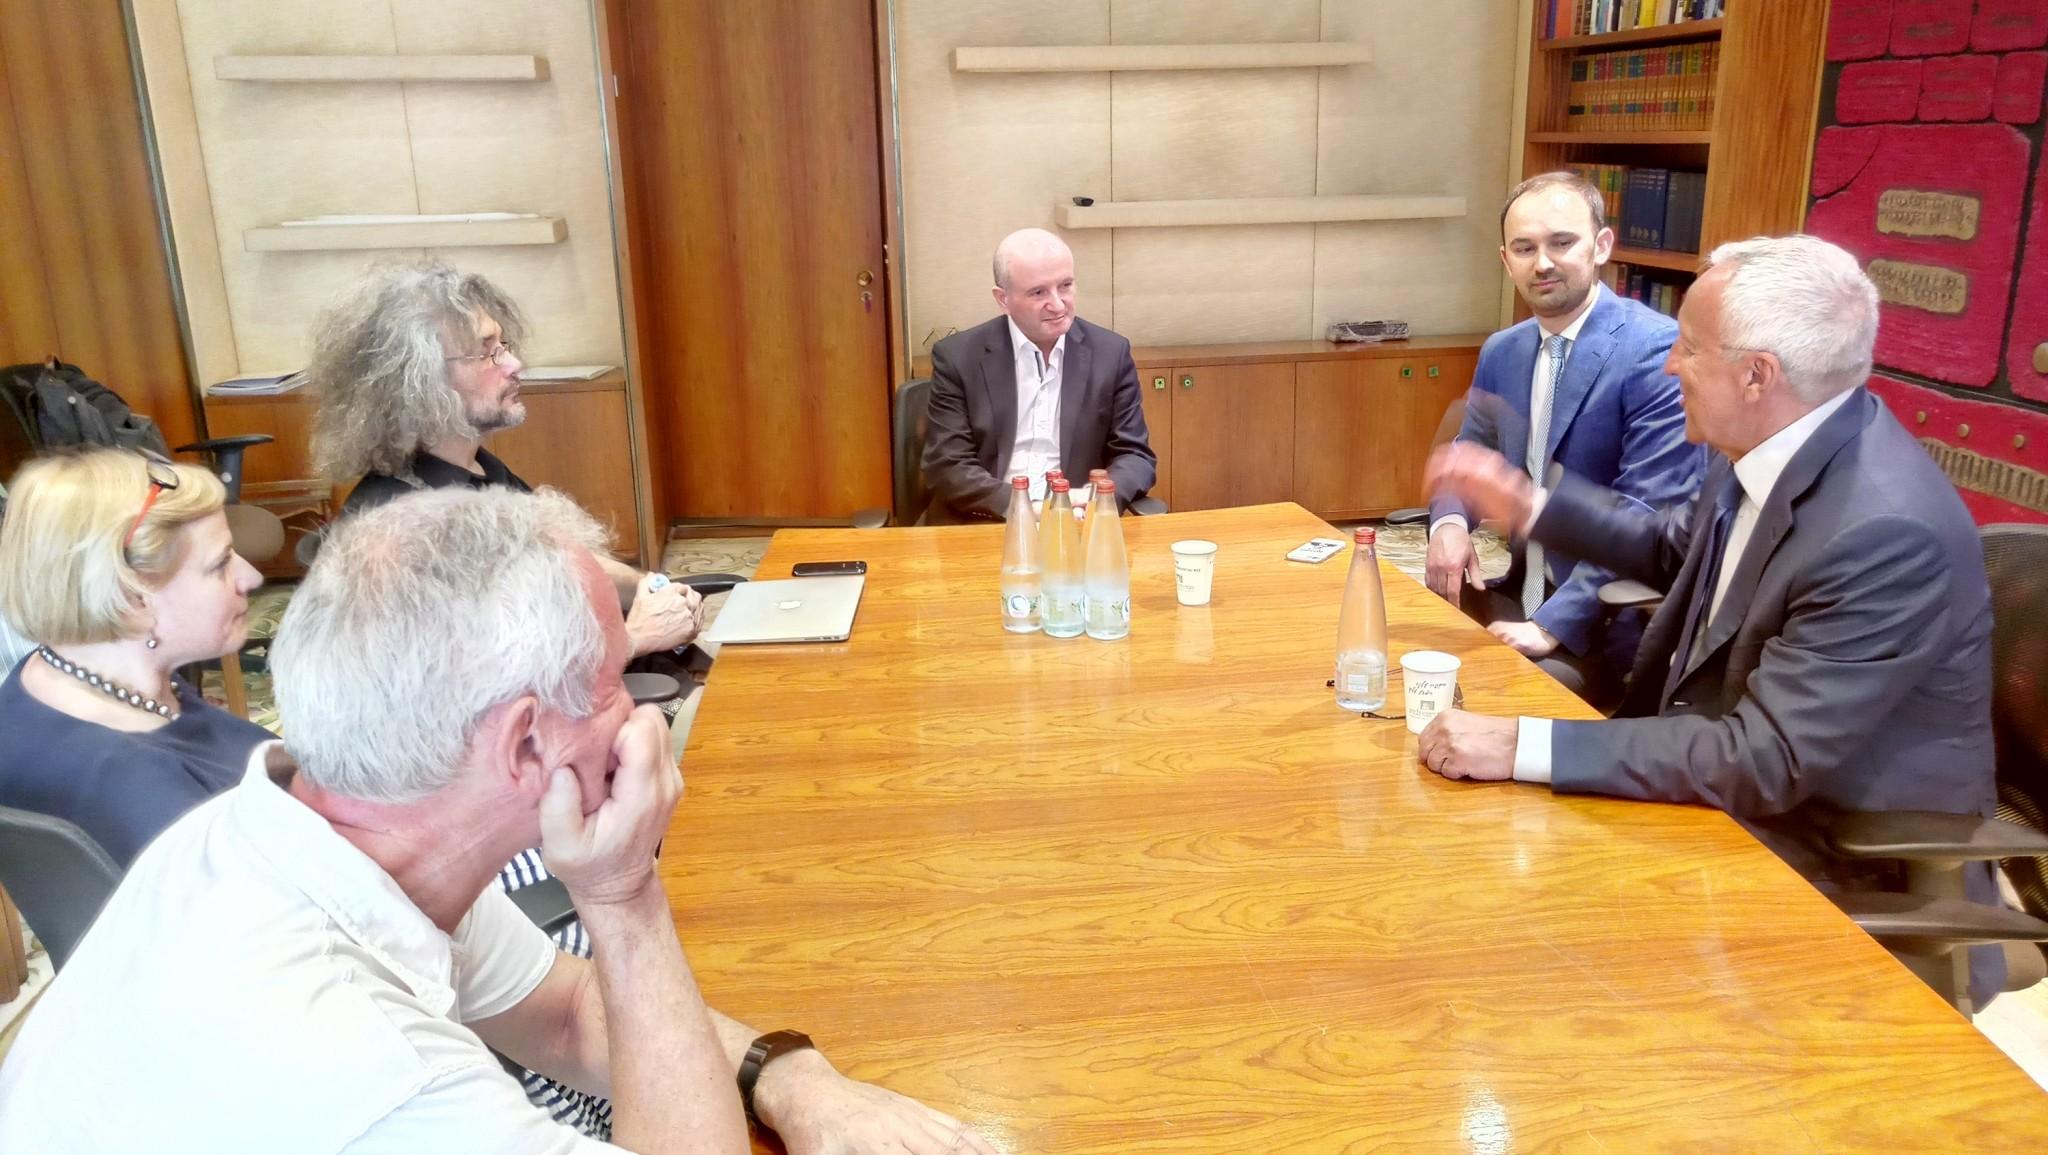 The Skoltech delegation meets with Weizmann Institute President Daniel Zajfman.